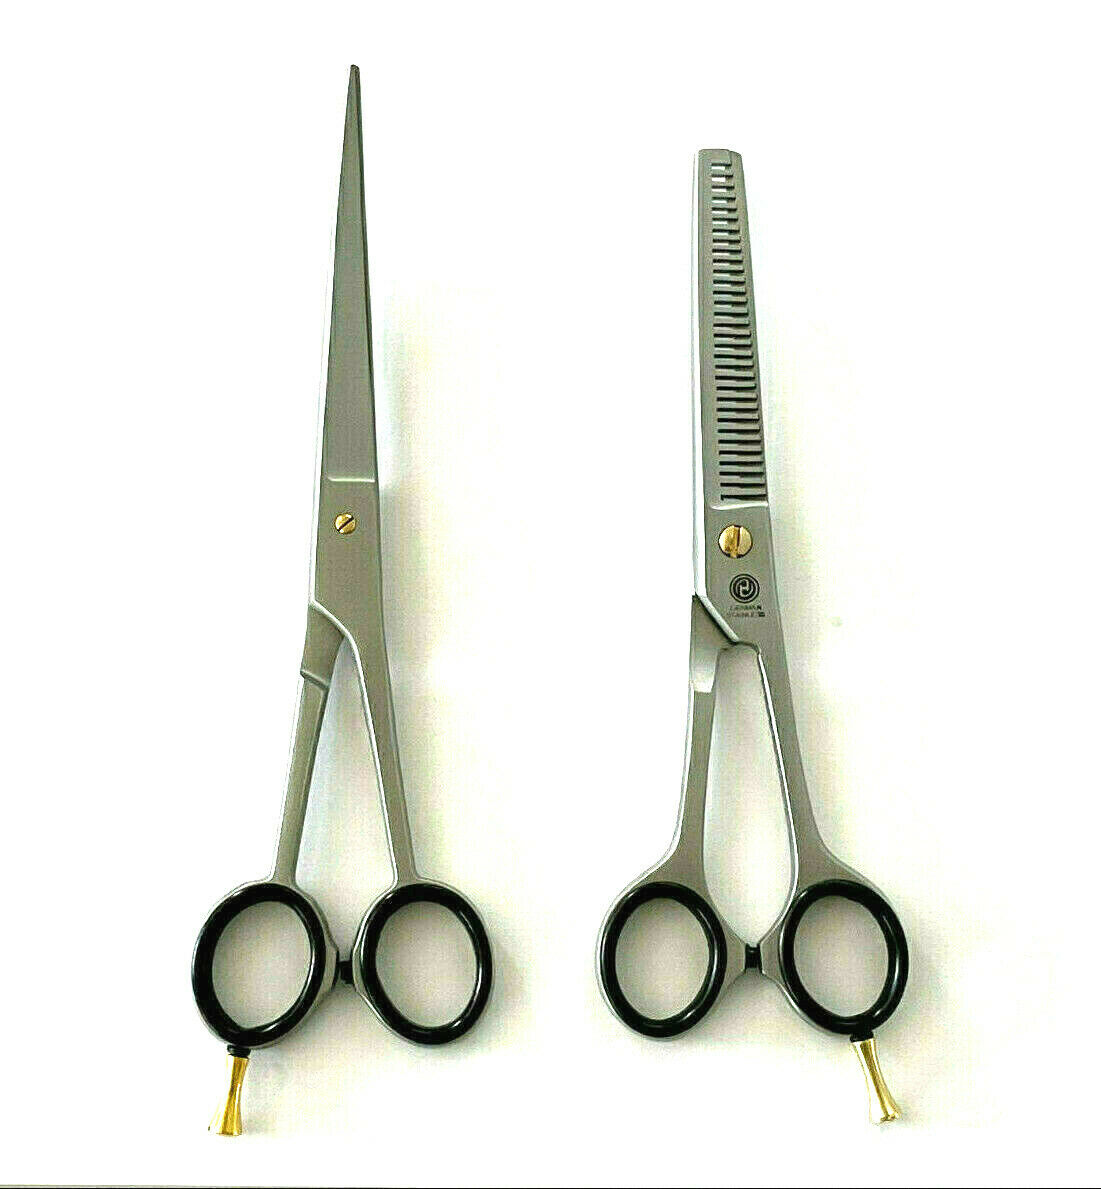 Double Teeth Thinning Shears